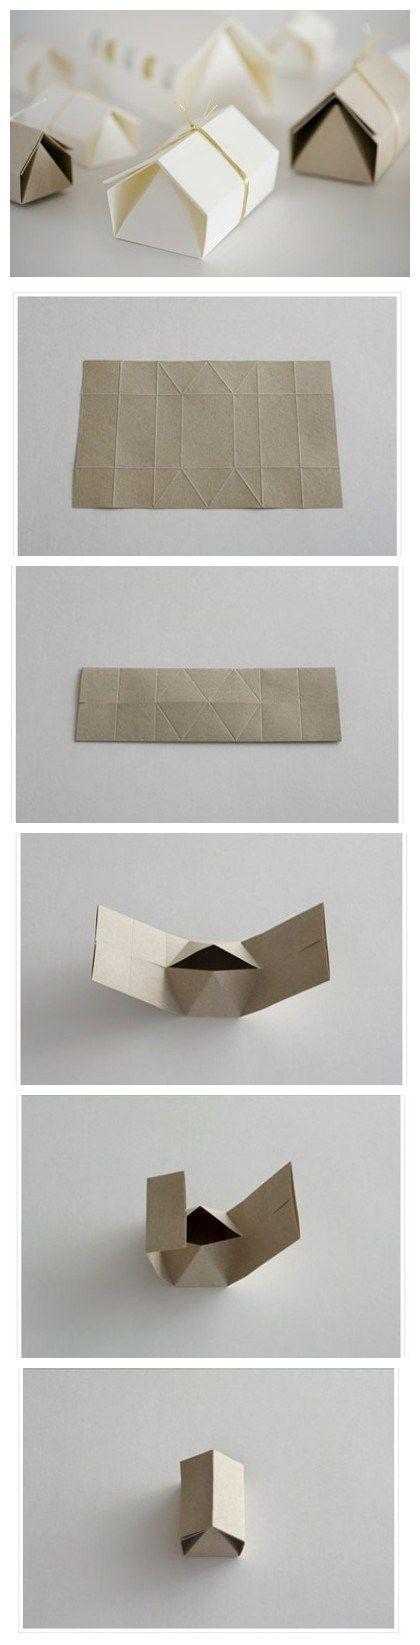 folding houses #DIY #paperhouse